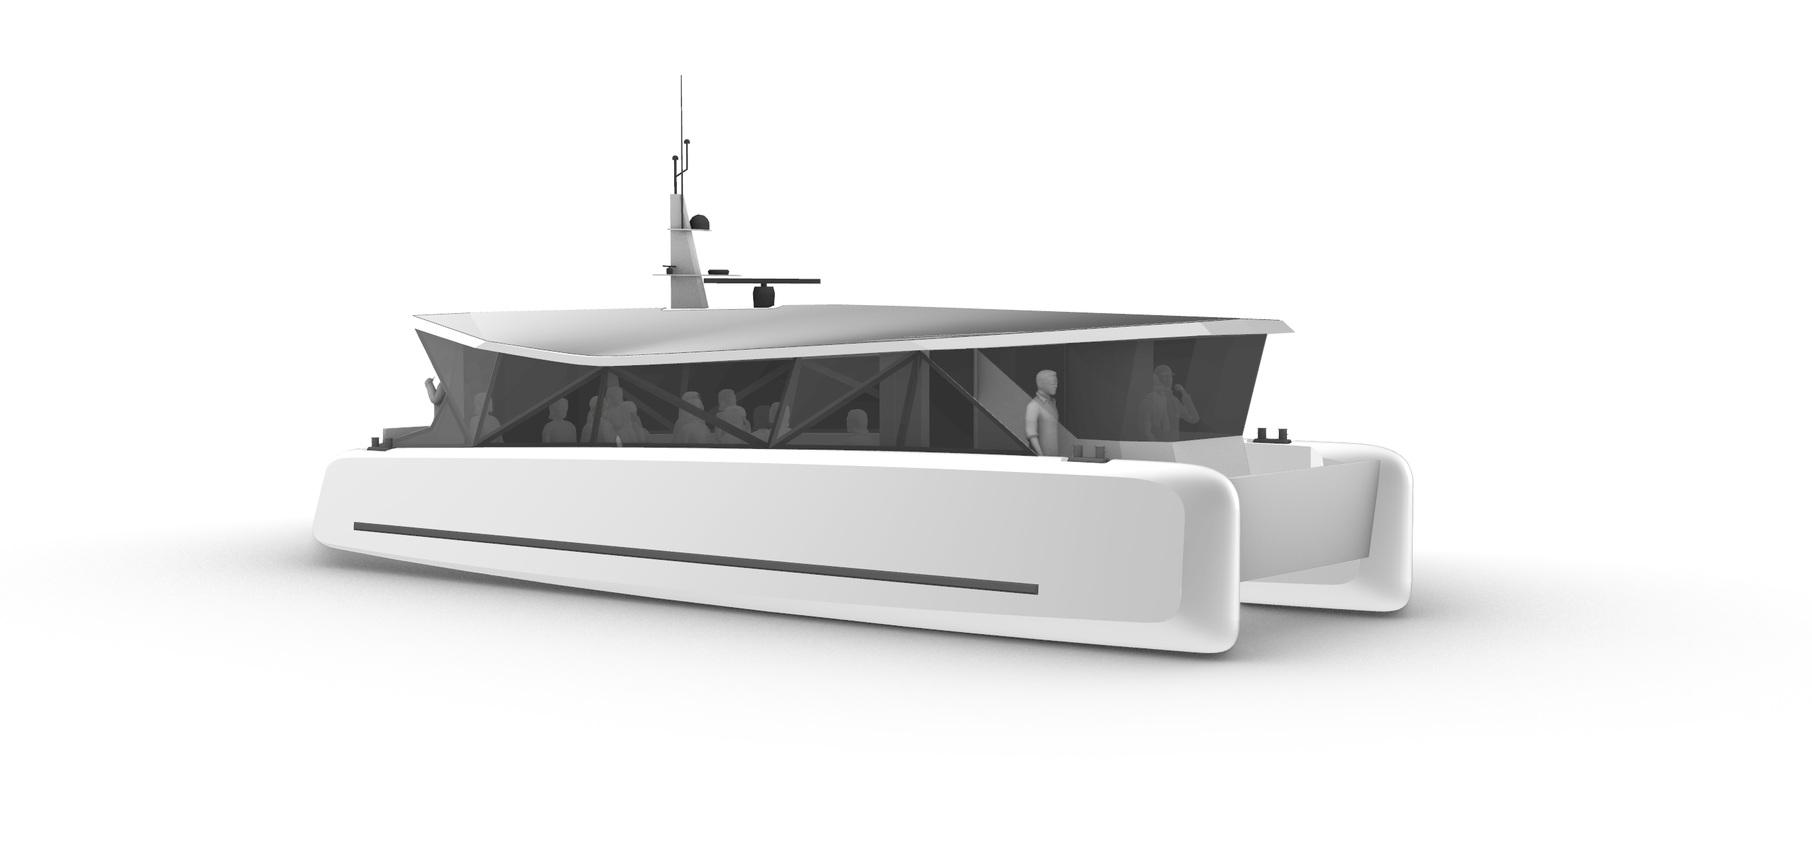 Solar_fuelled_boat_Pivot_Concept.jpg